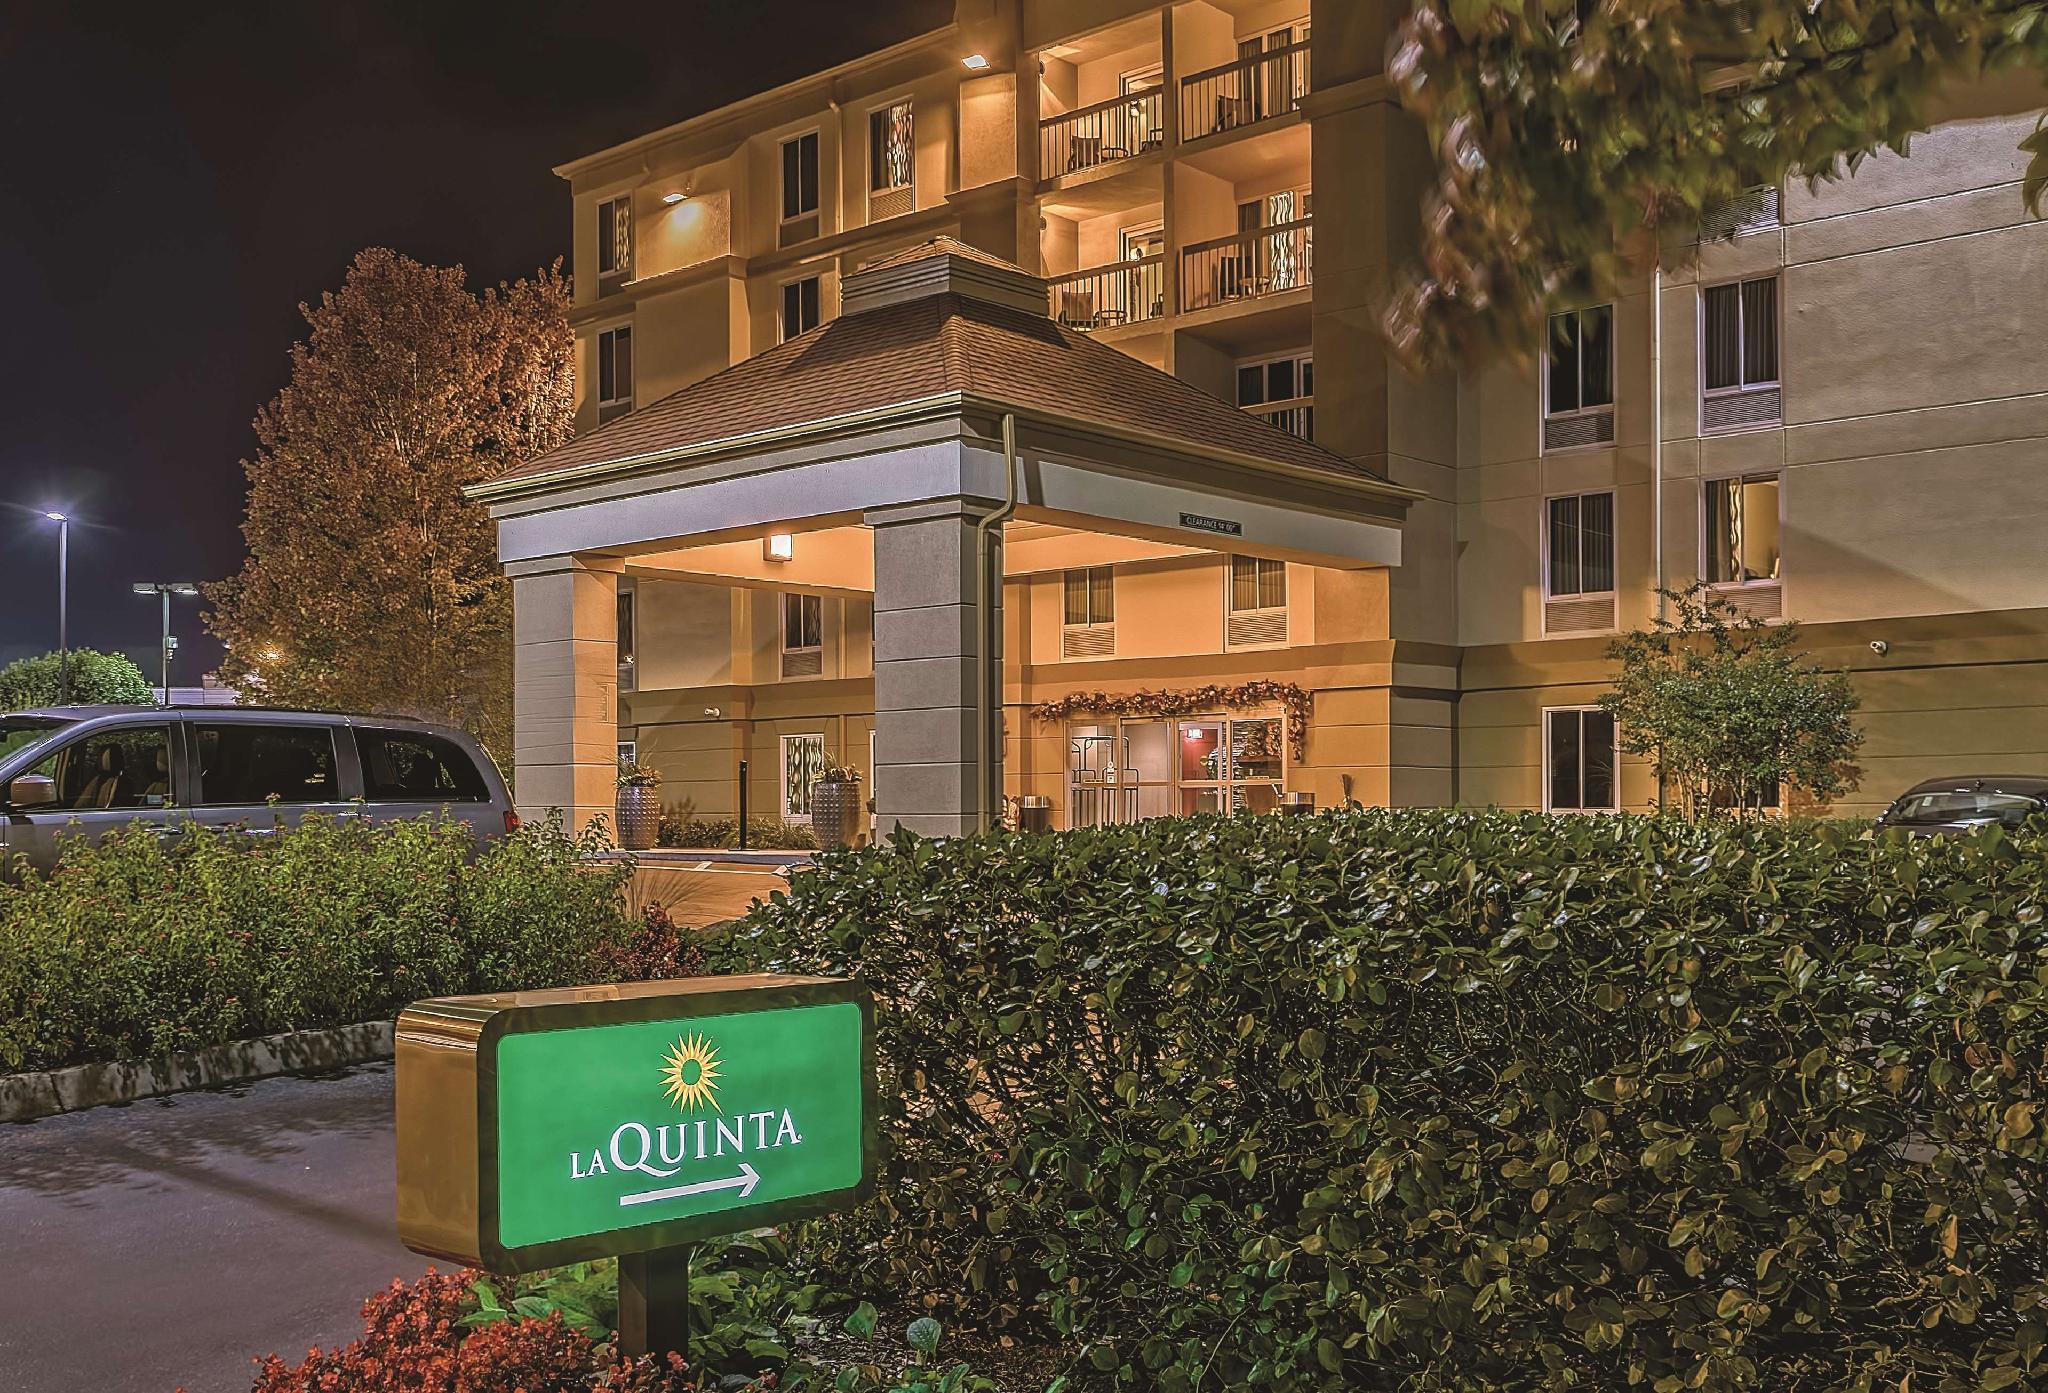 La Quinta Inn And Suites By Wyndham Pigeon Forge